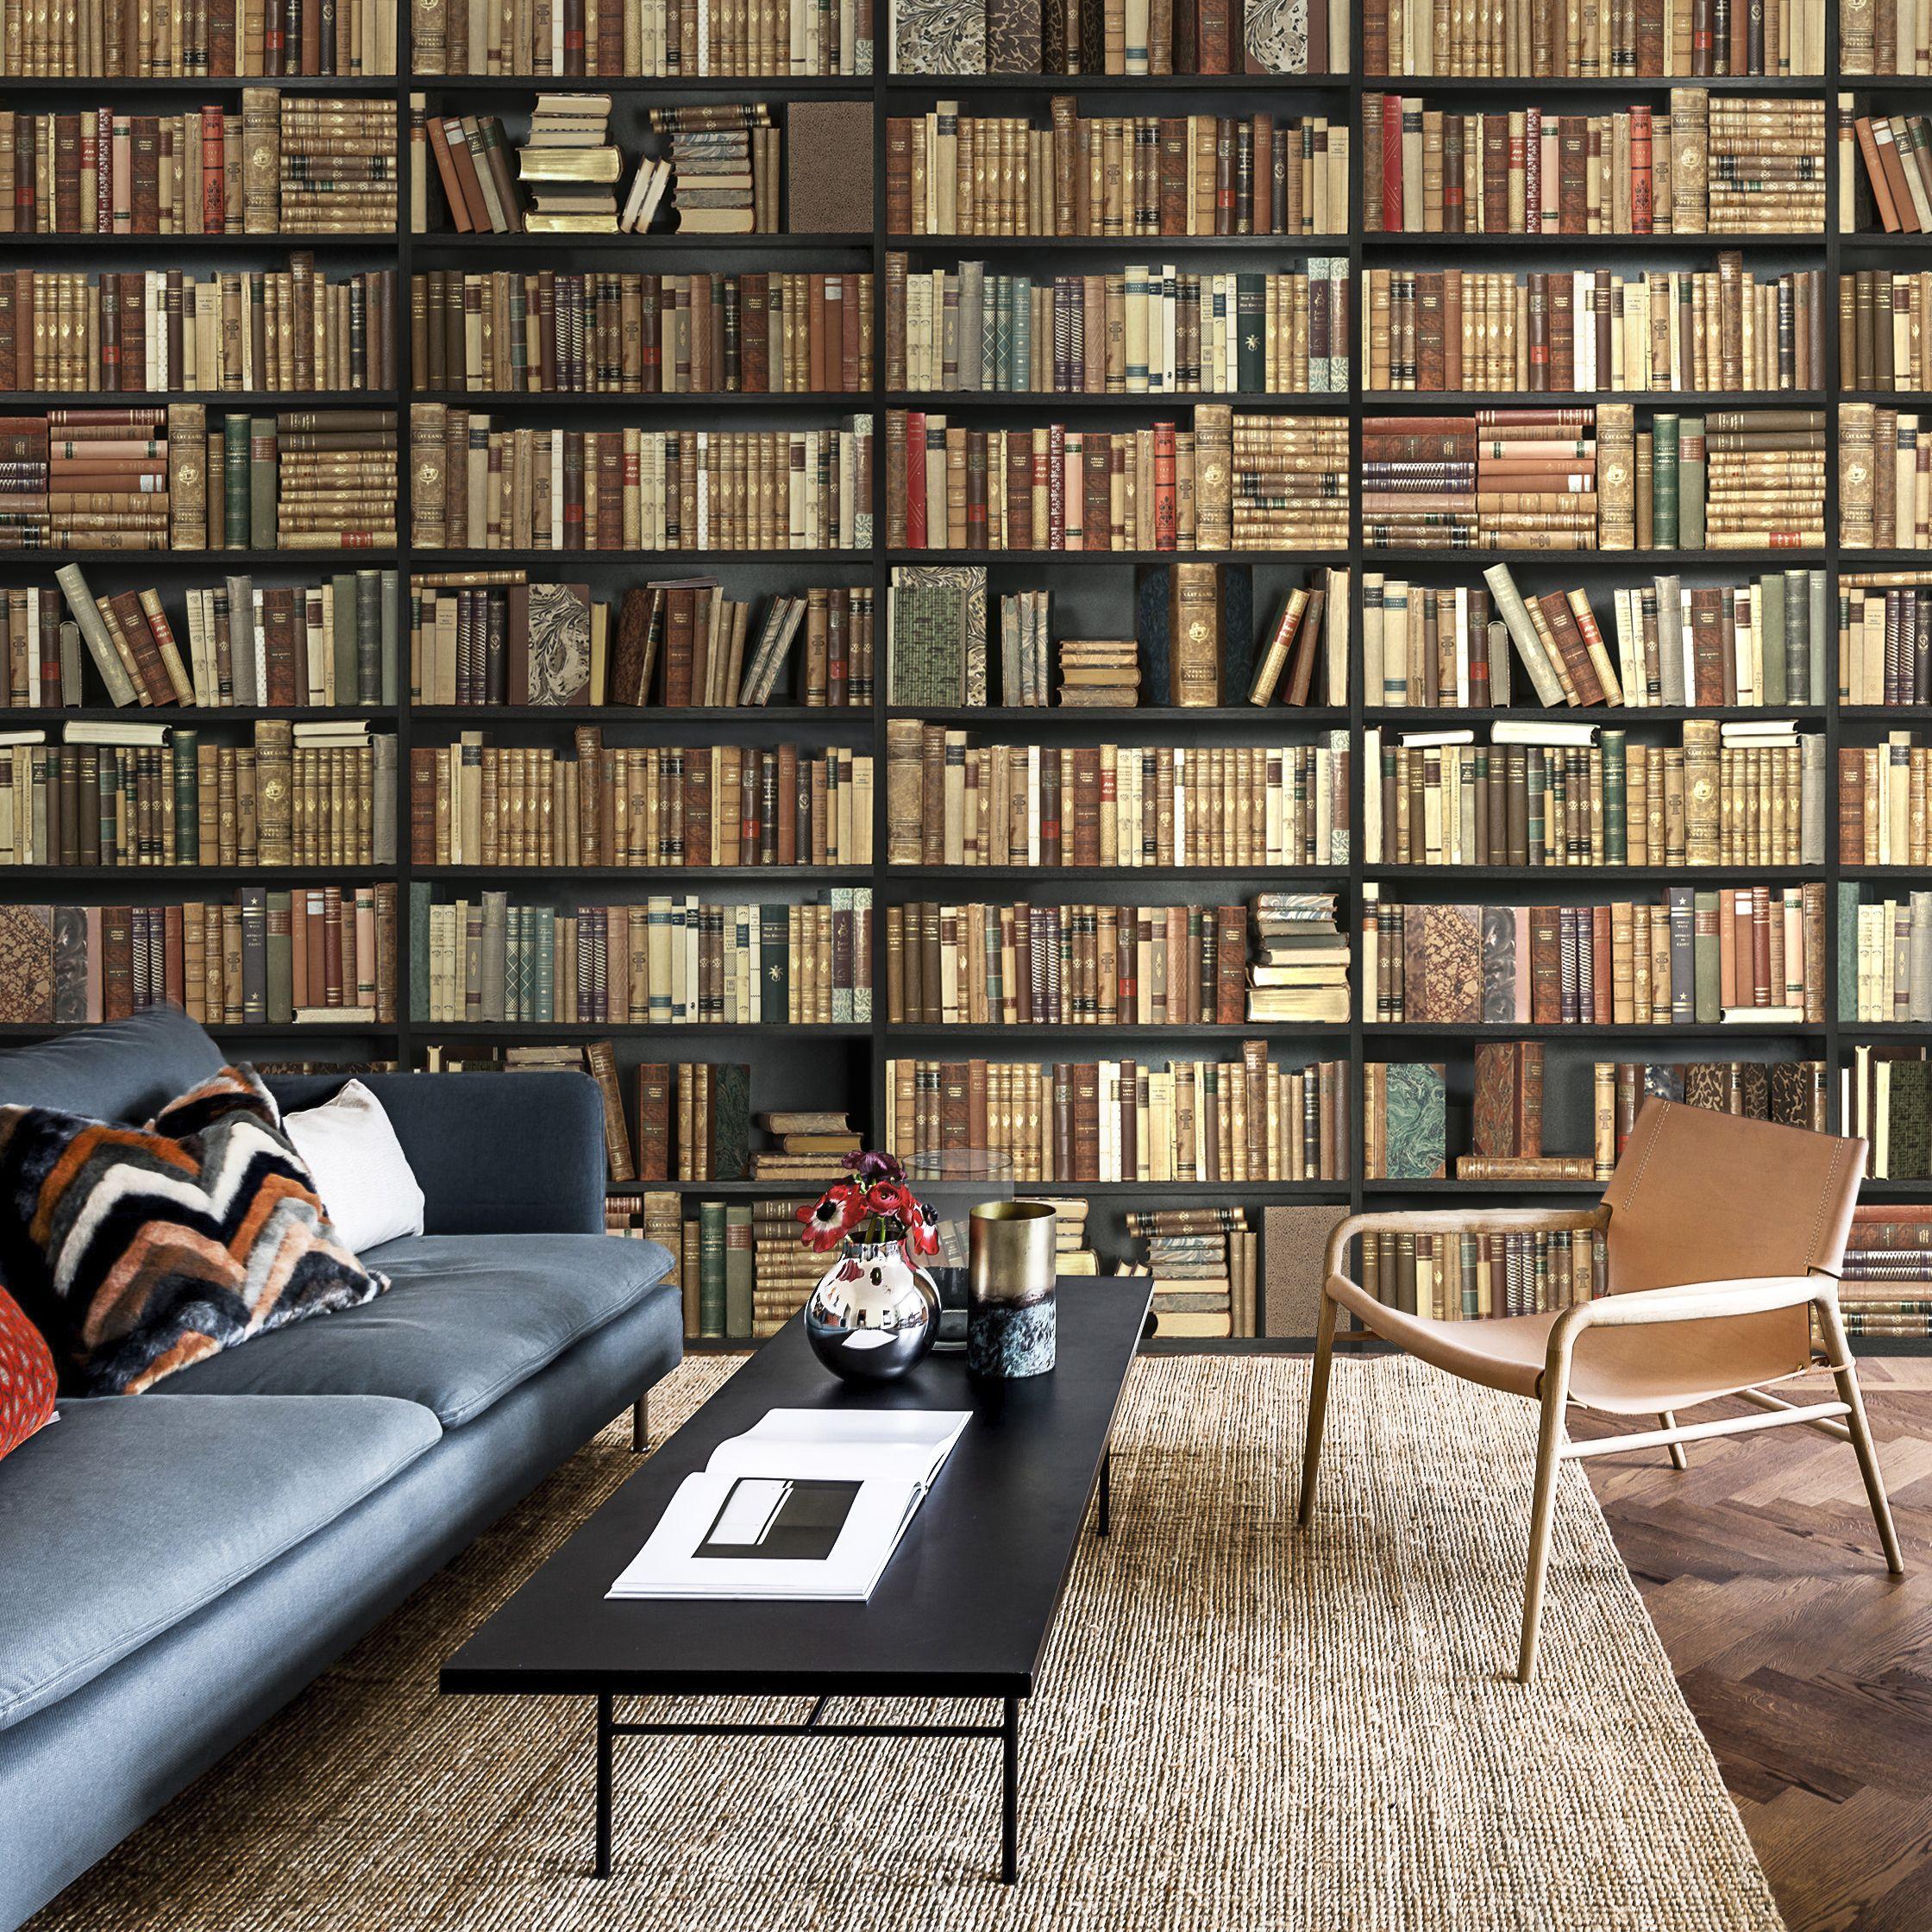 Bookshelf Wallpaper Bookshelf Wallpaper Wallmural Wallpaper Bookshelf Wallpaper Furniture Wall Bookshelves